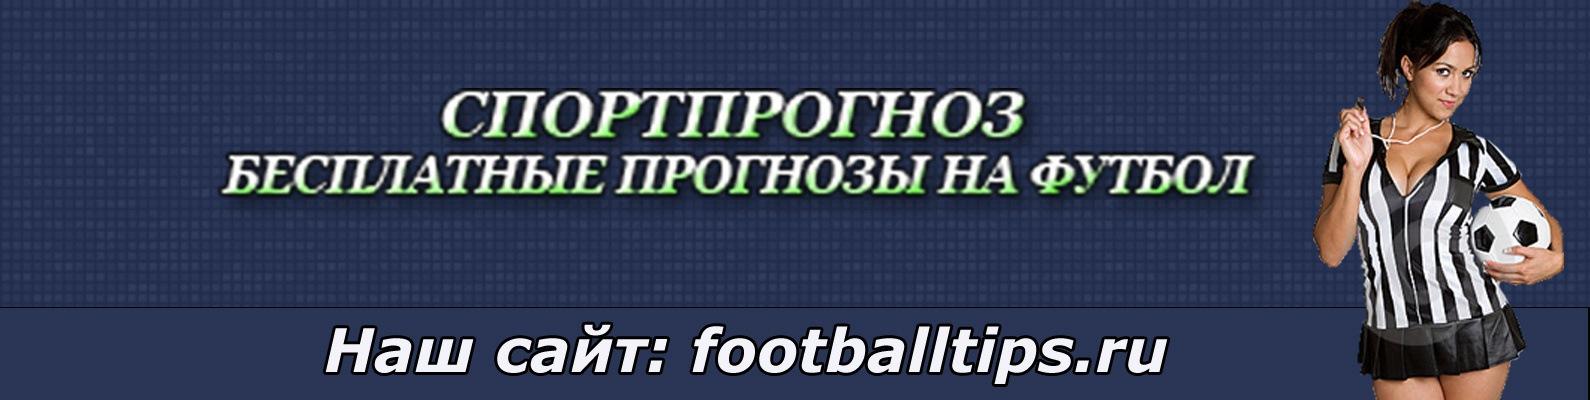 На футбол прогнозы спортпрогноз